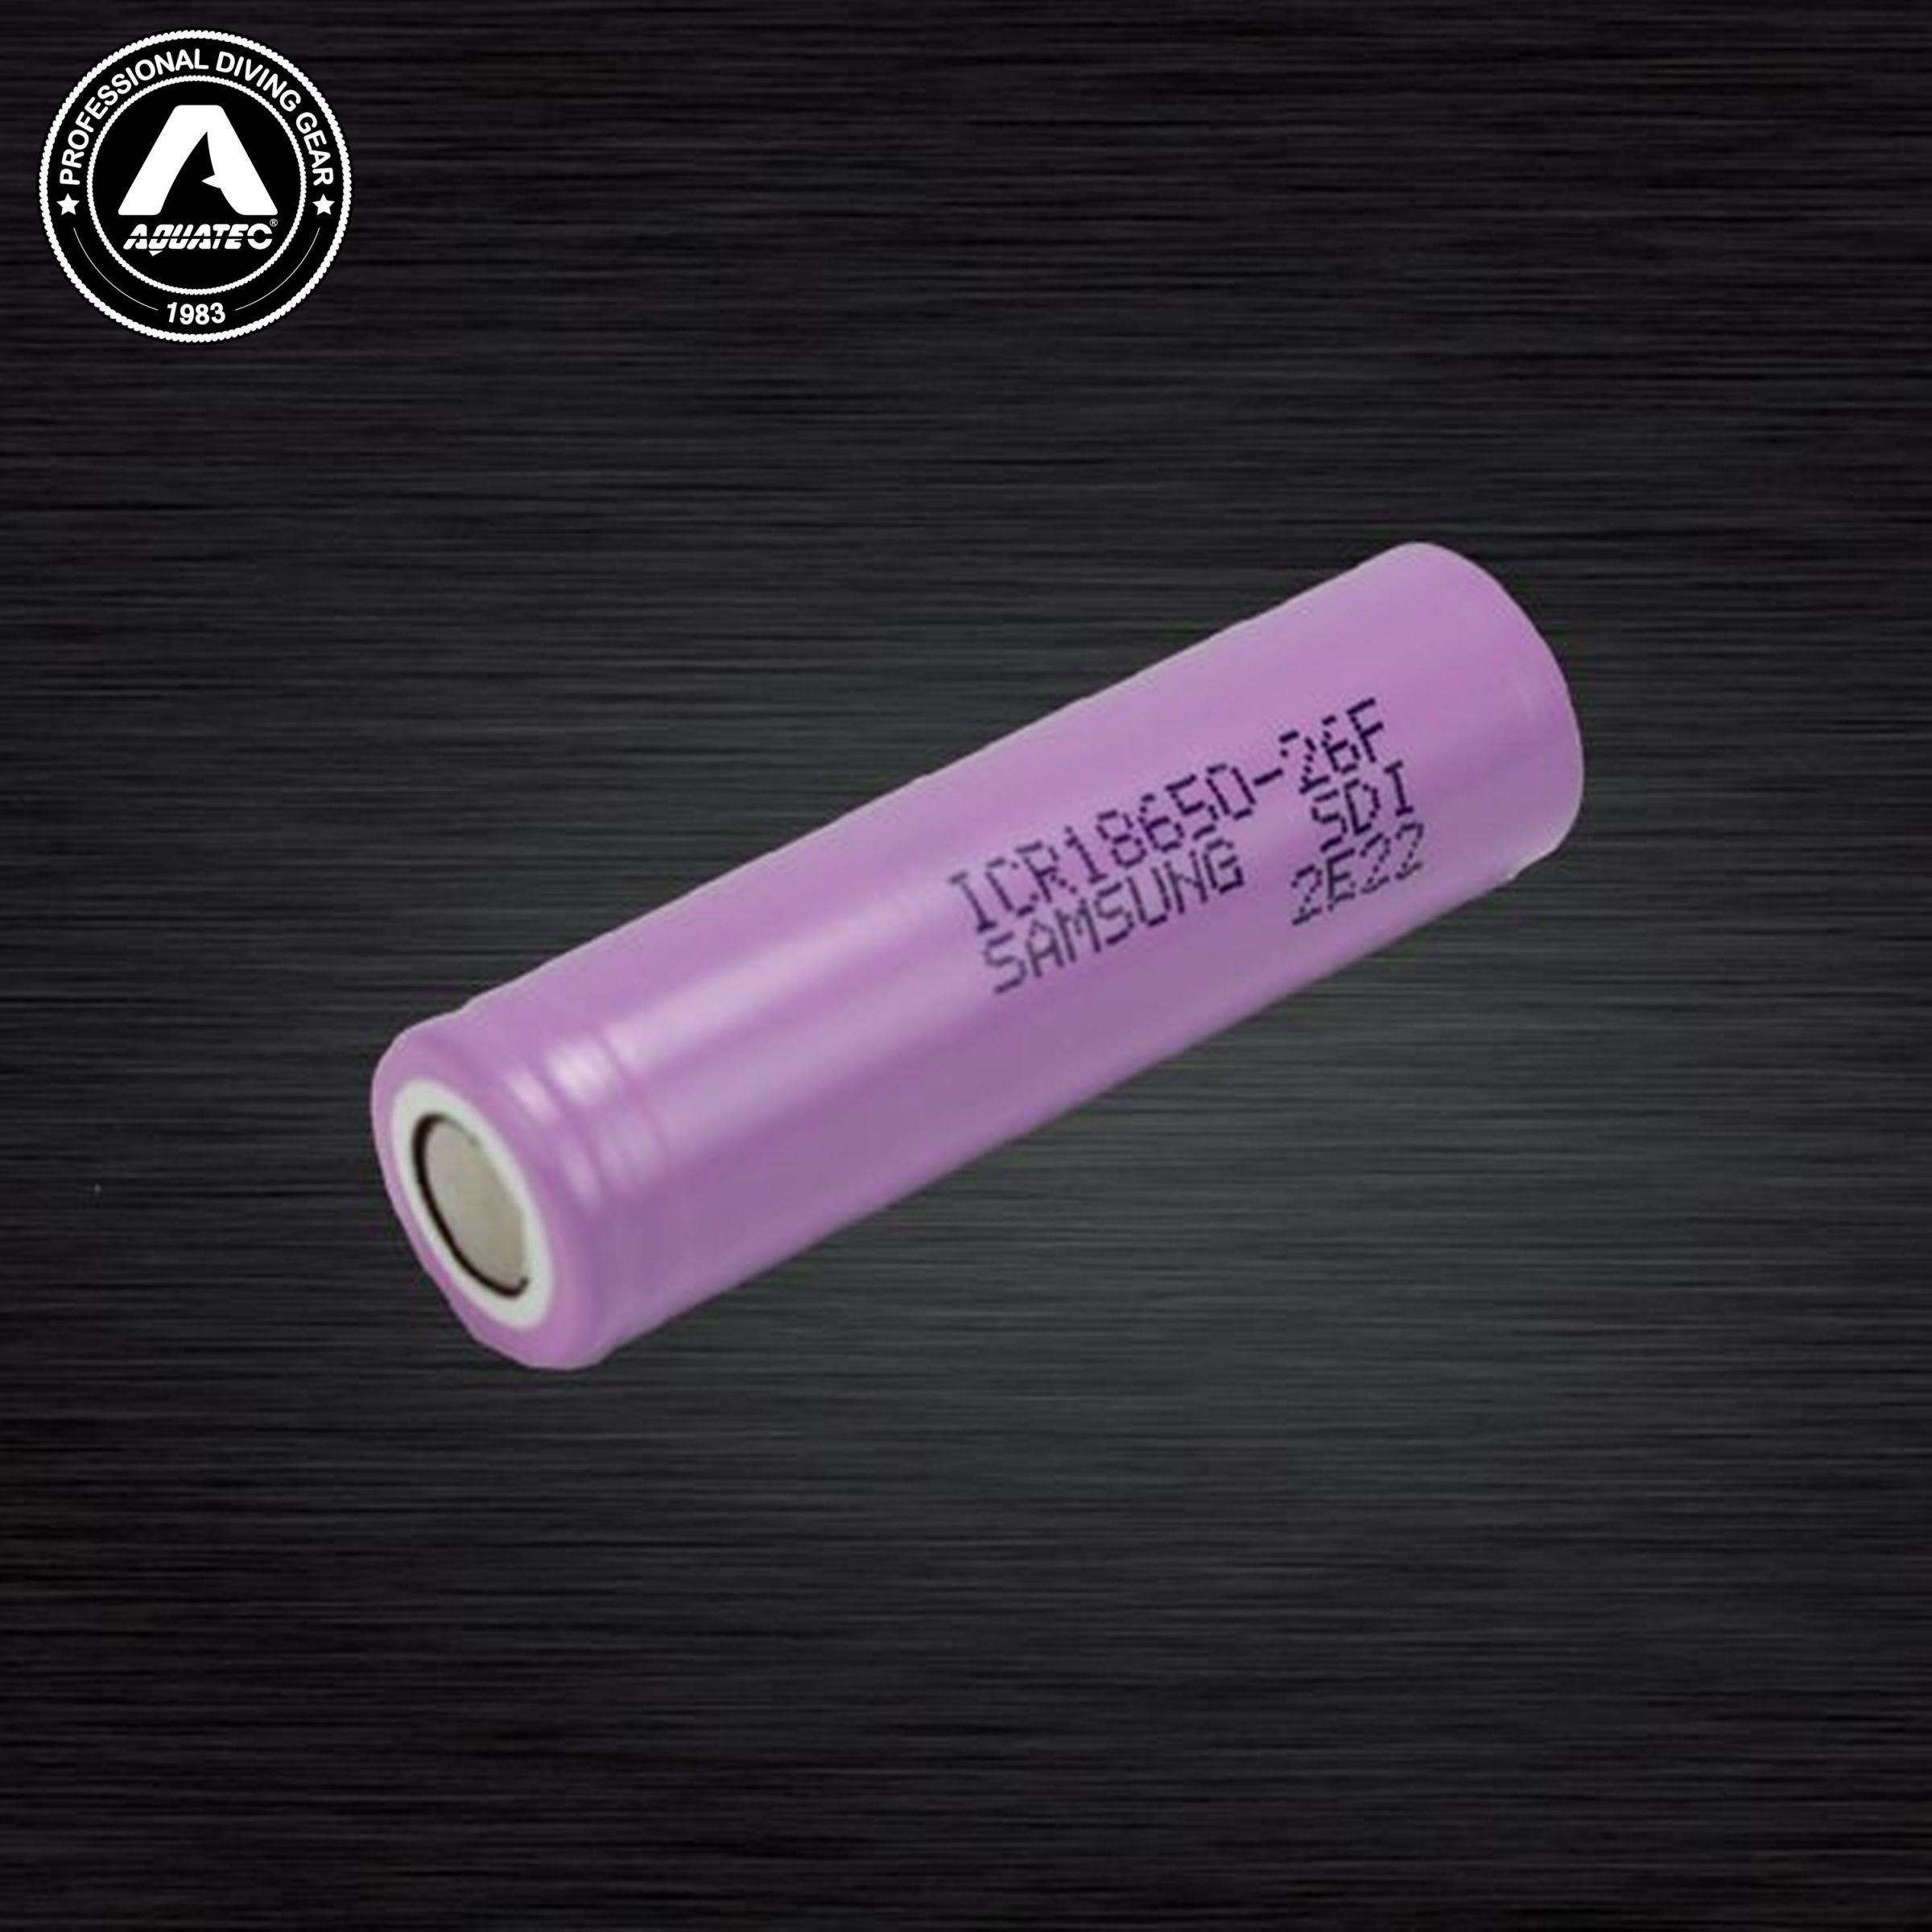 Samsung 18650 Battery - Samsung 18650 Battery